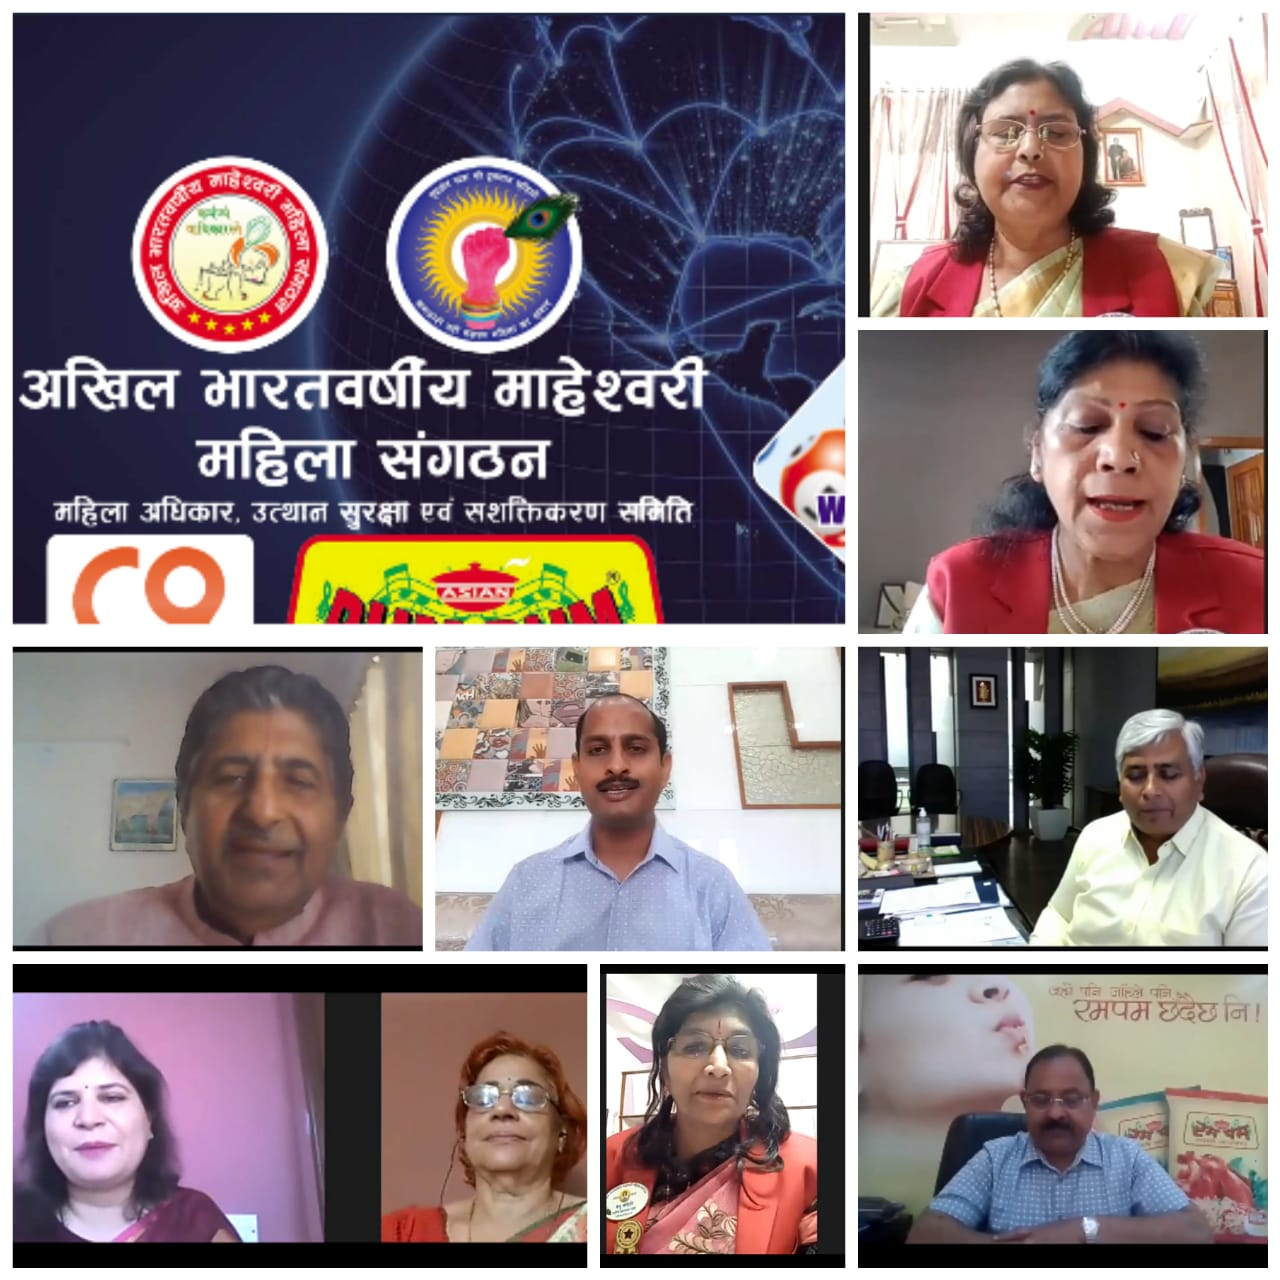 sakhi-expo-website-launch